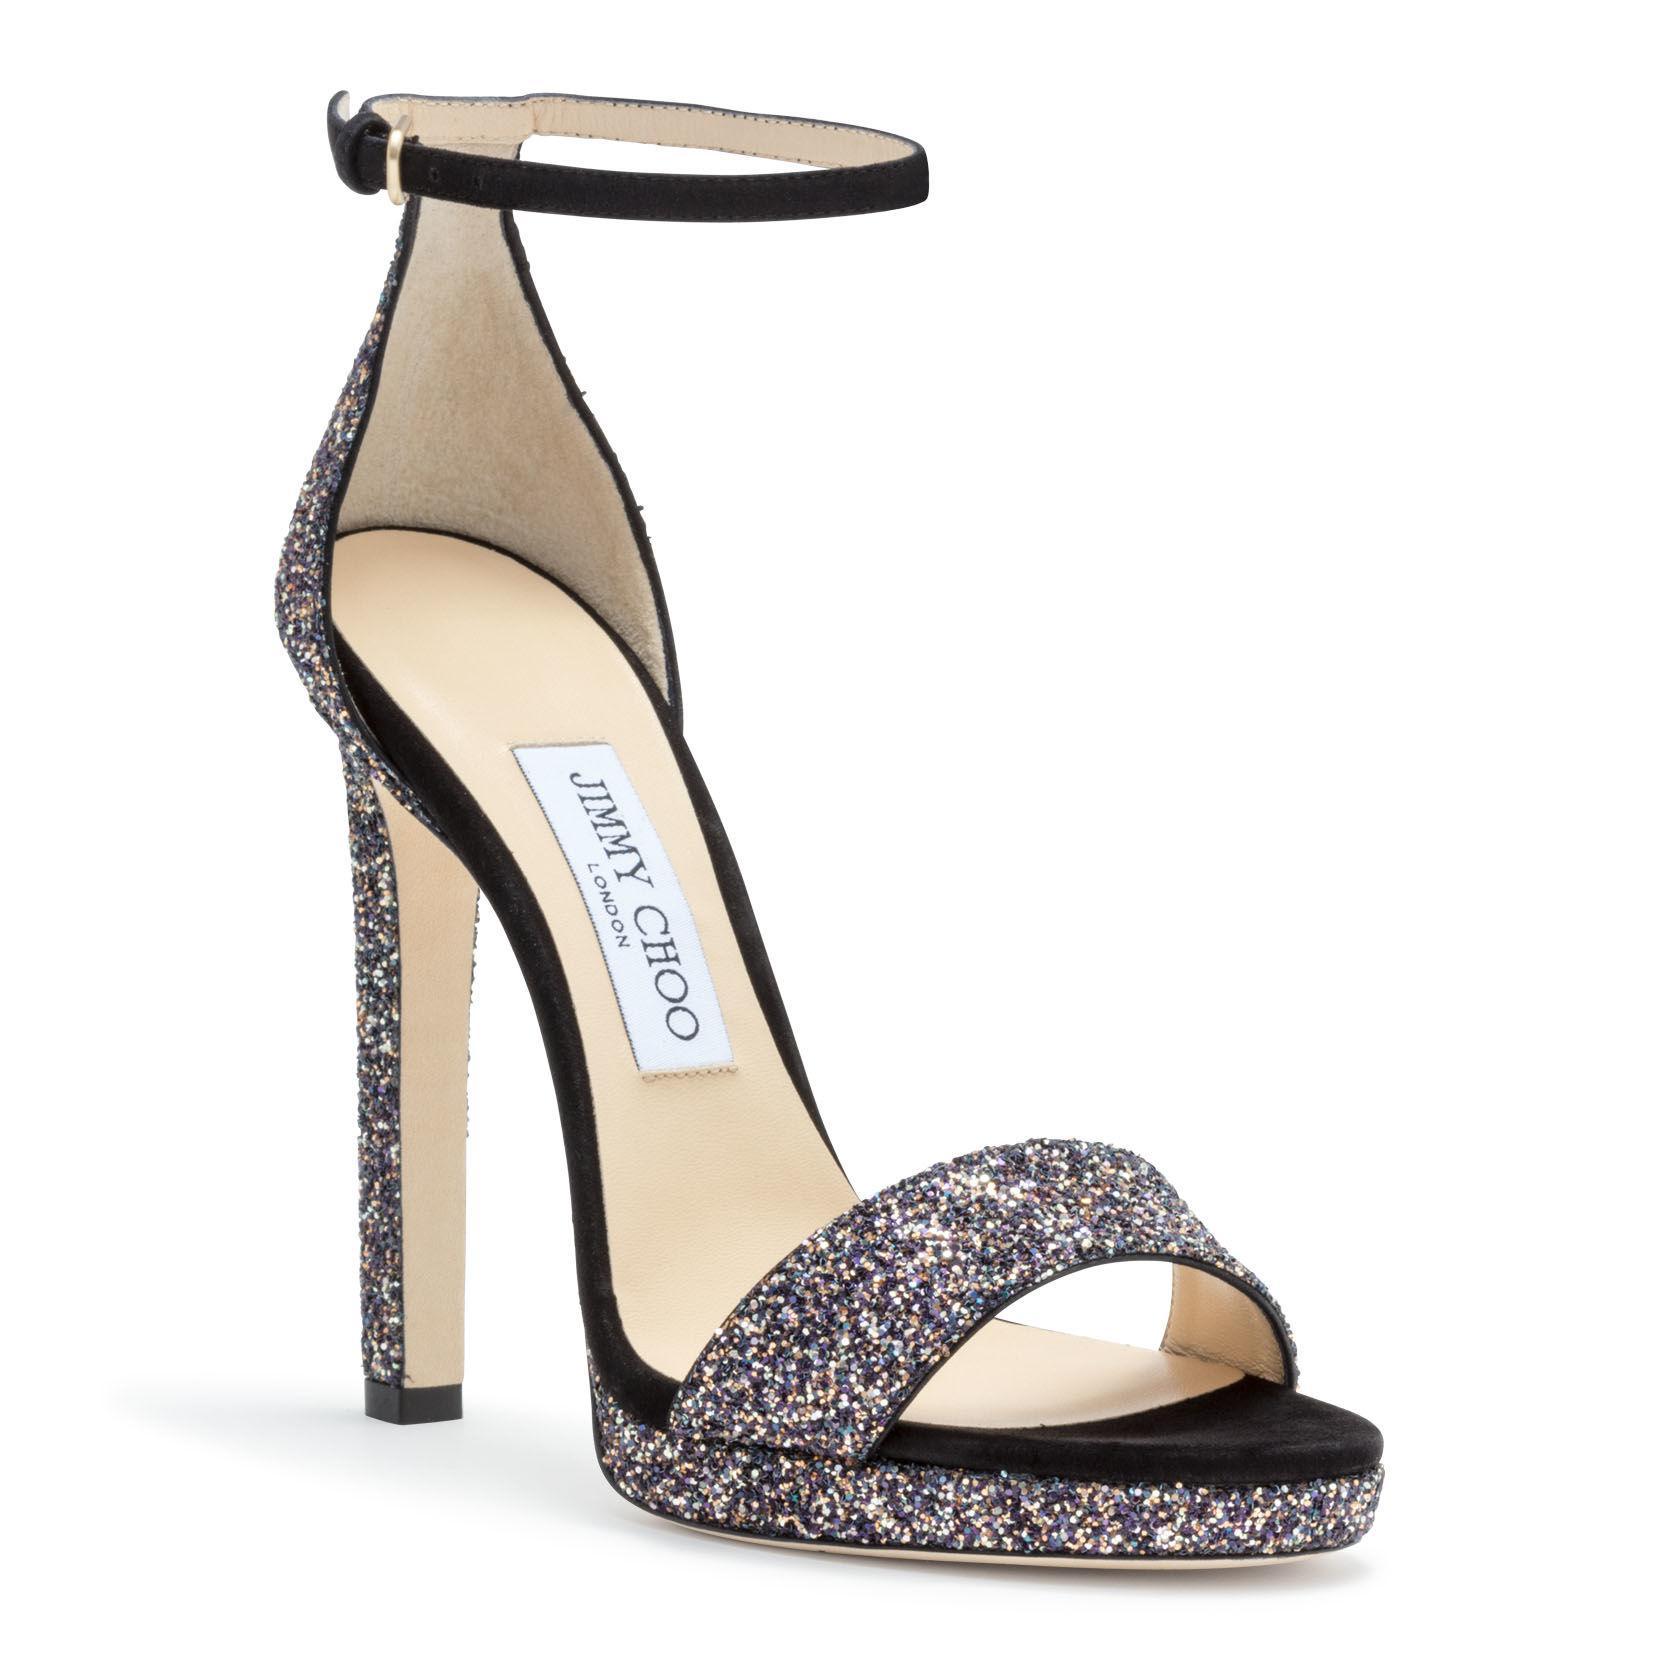 cf439ae746d7 Jimmy Choo - Metallic Misty 120 Black Suede Glitter Sandals - Lyst. View  fullscreen